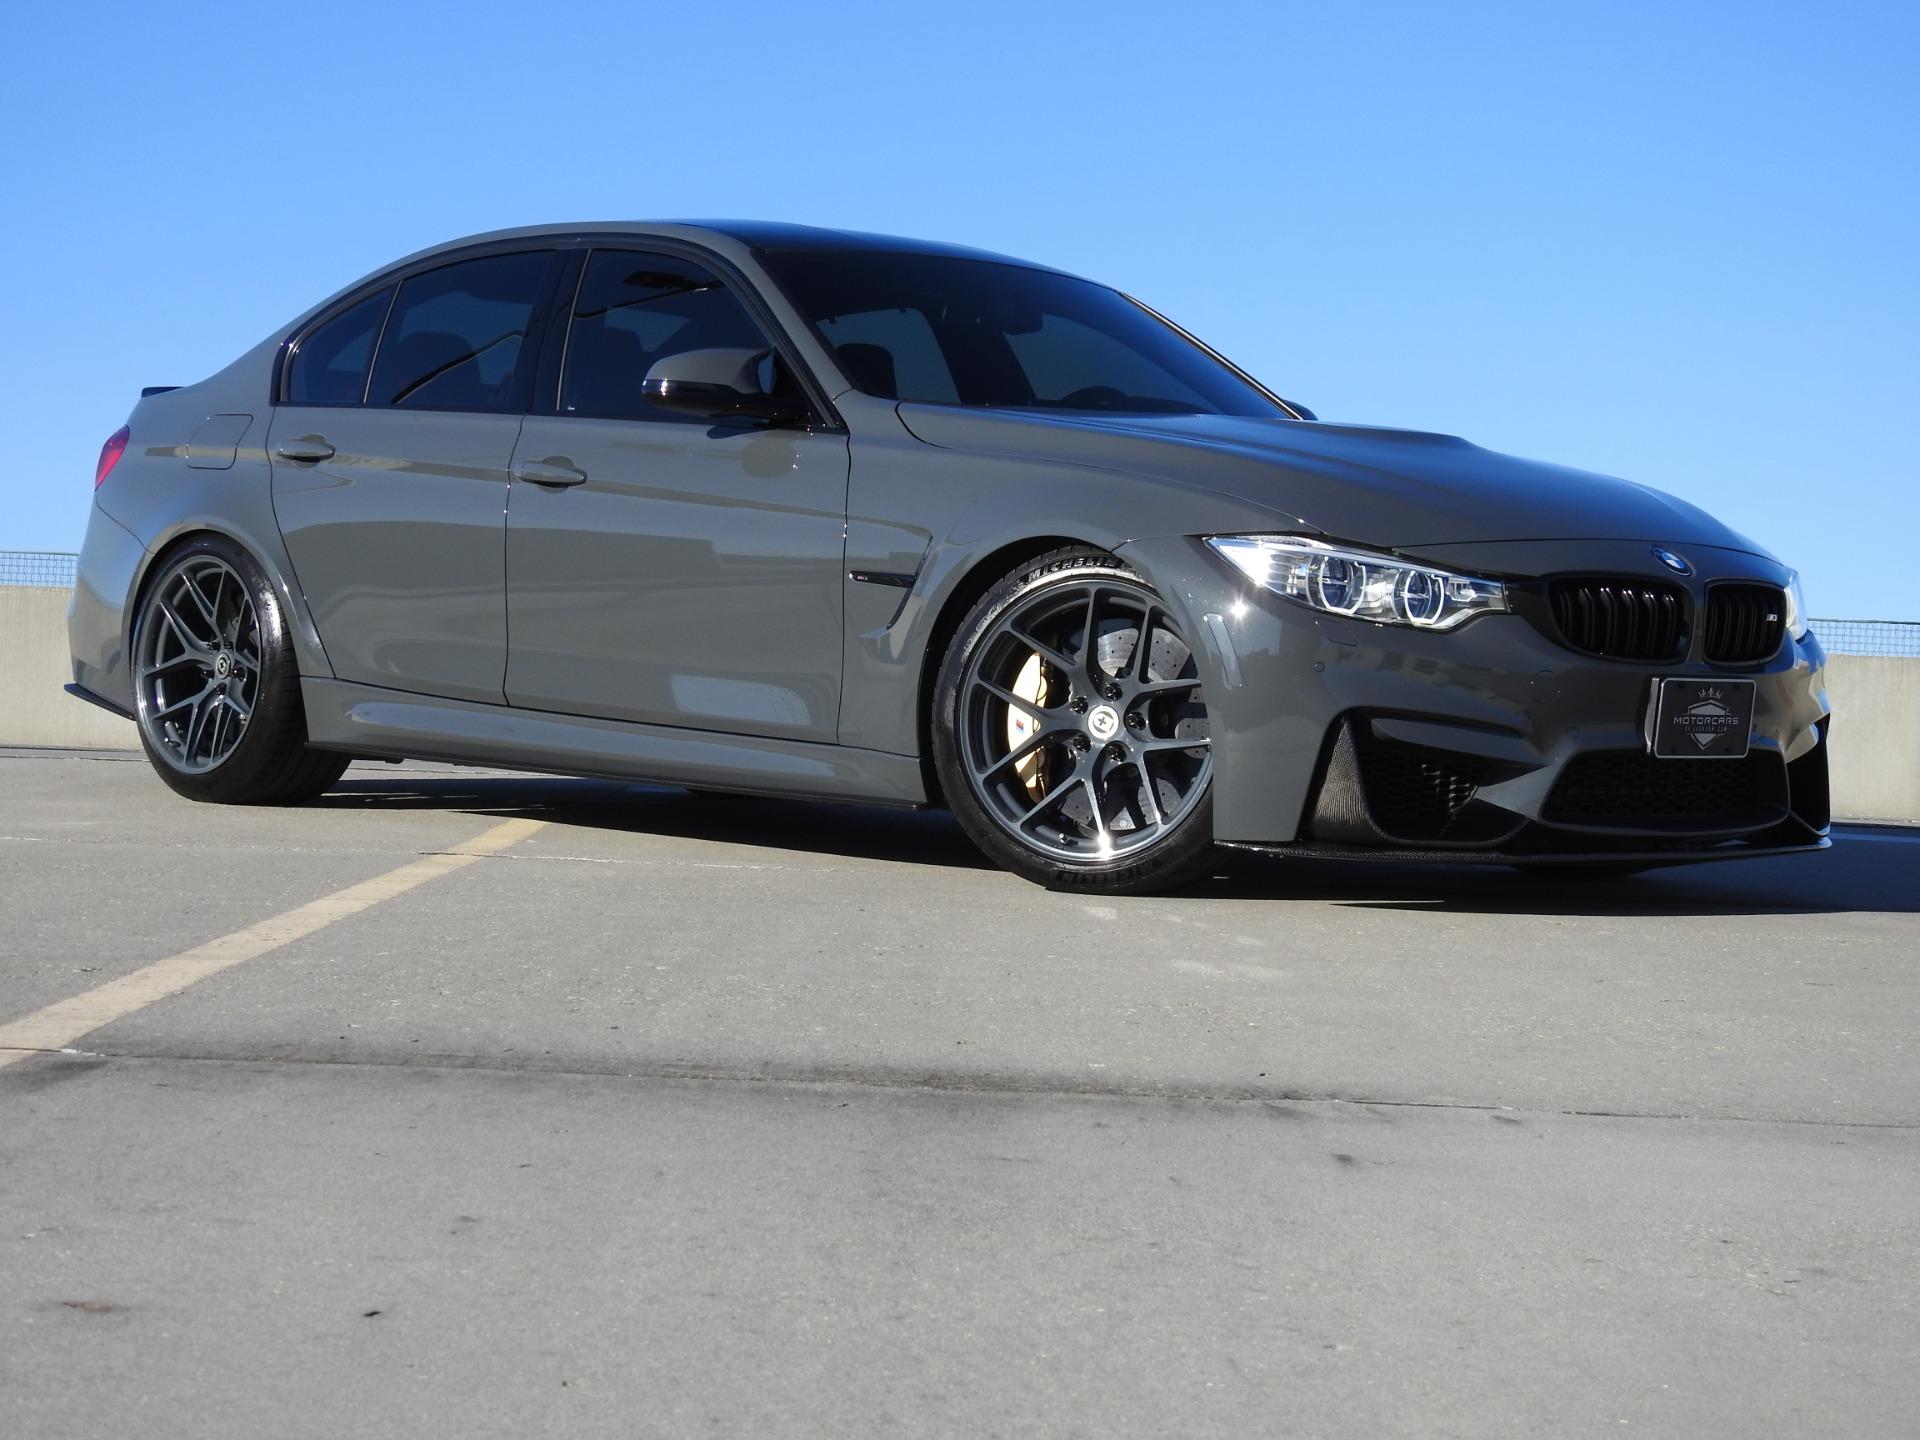 Used 2016 BMW M3 Dinan Stage 3 w/ $35K+ Mods  | Jackson, MS